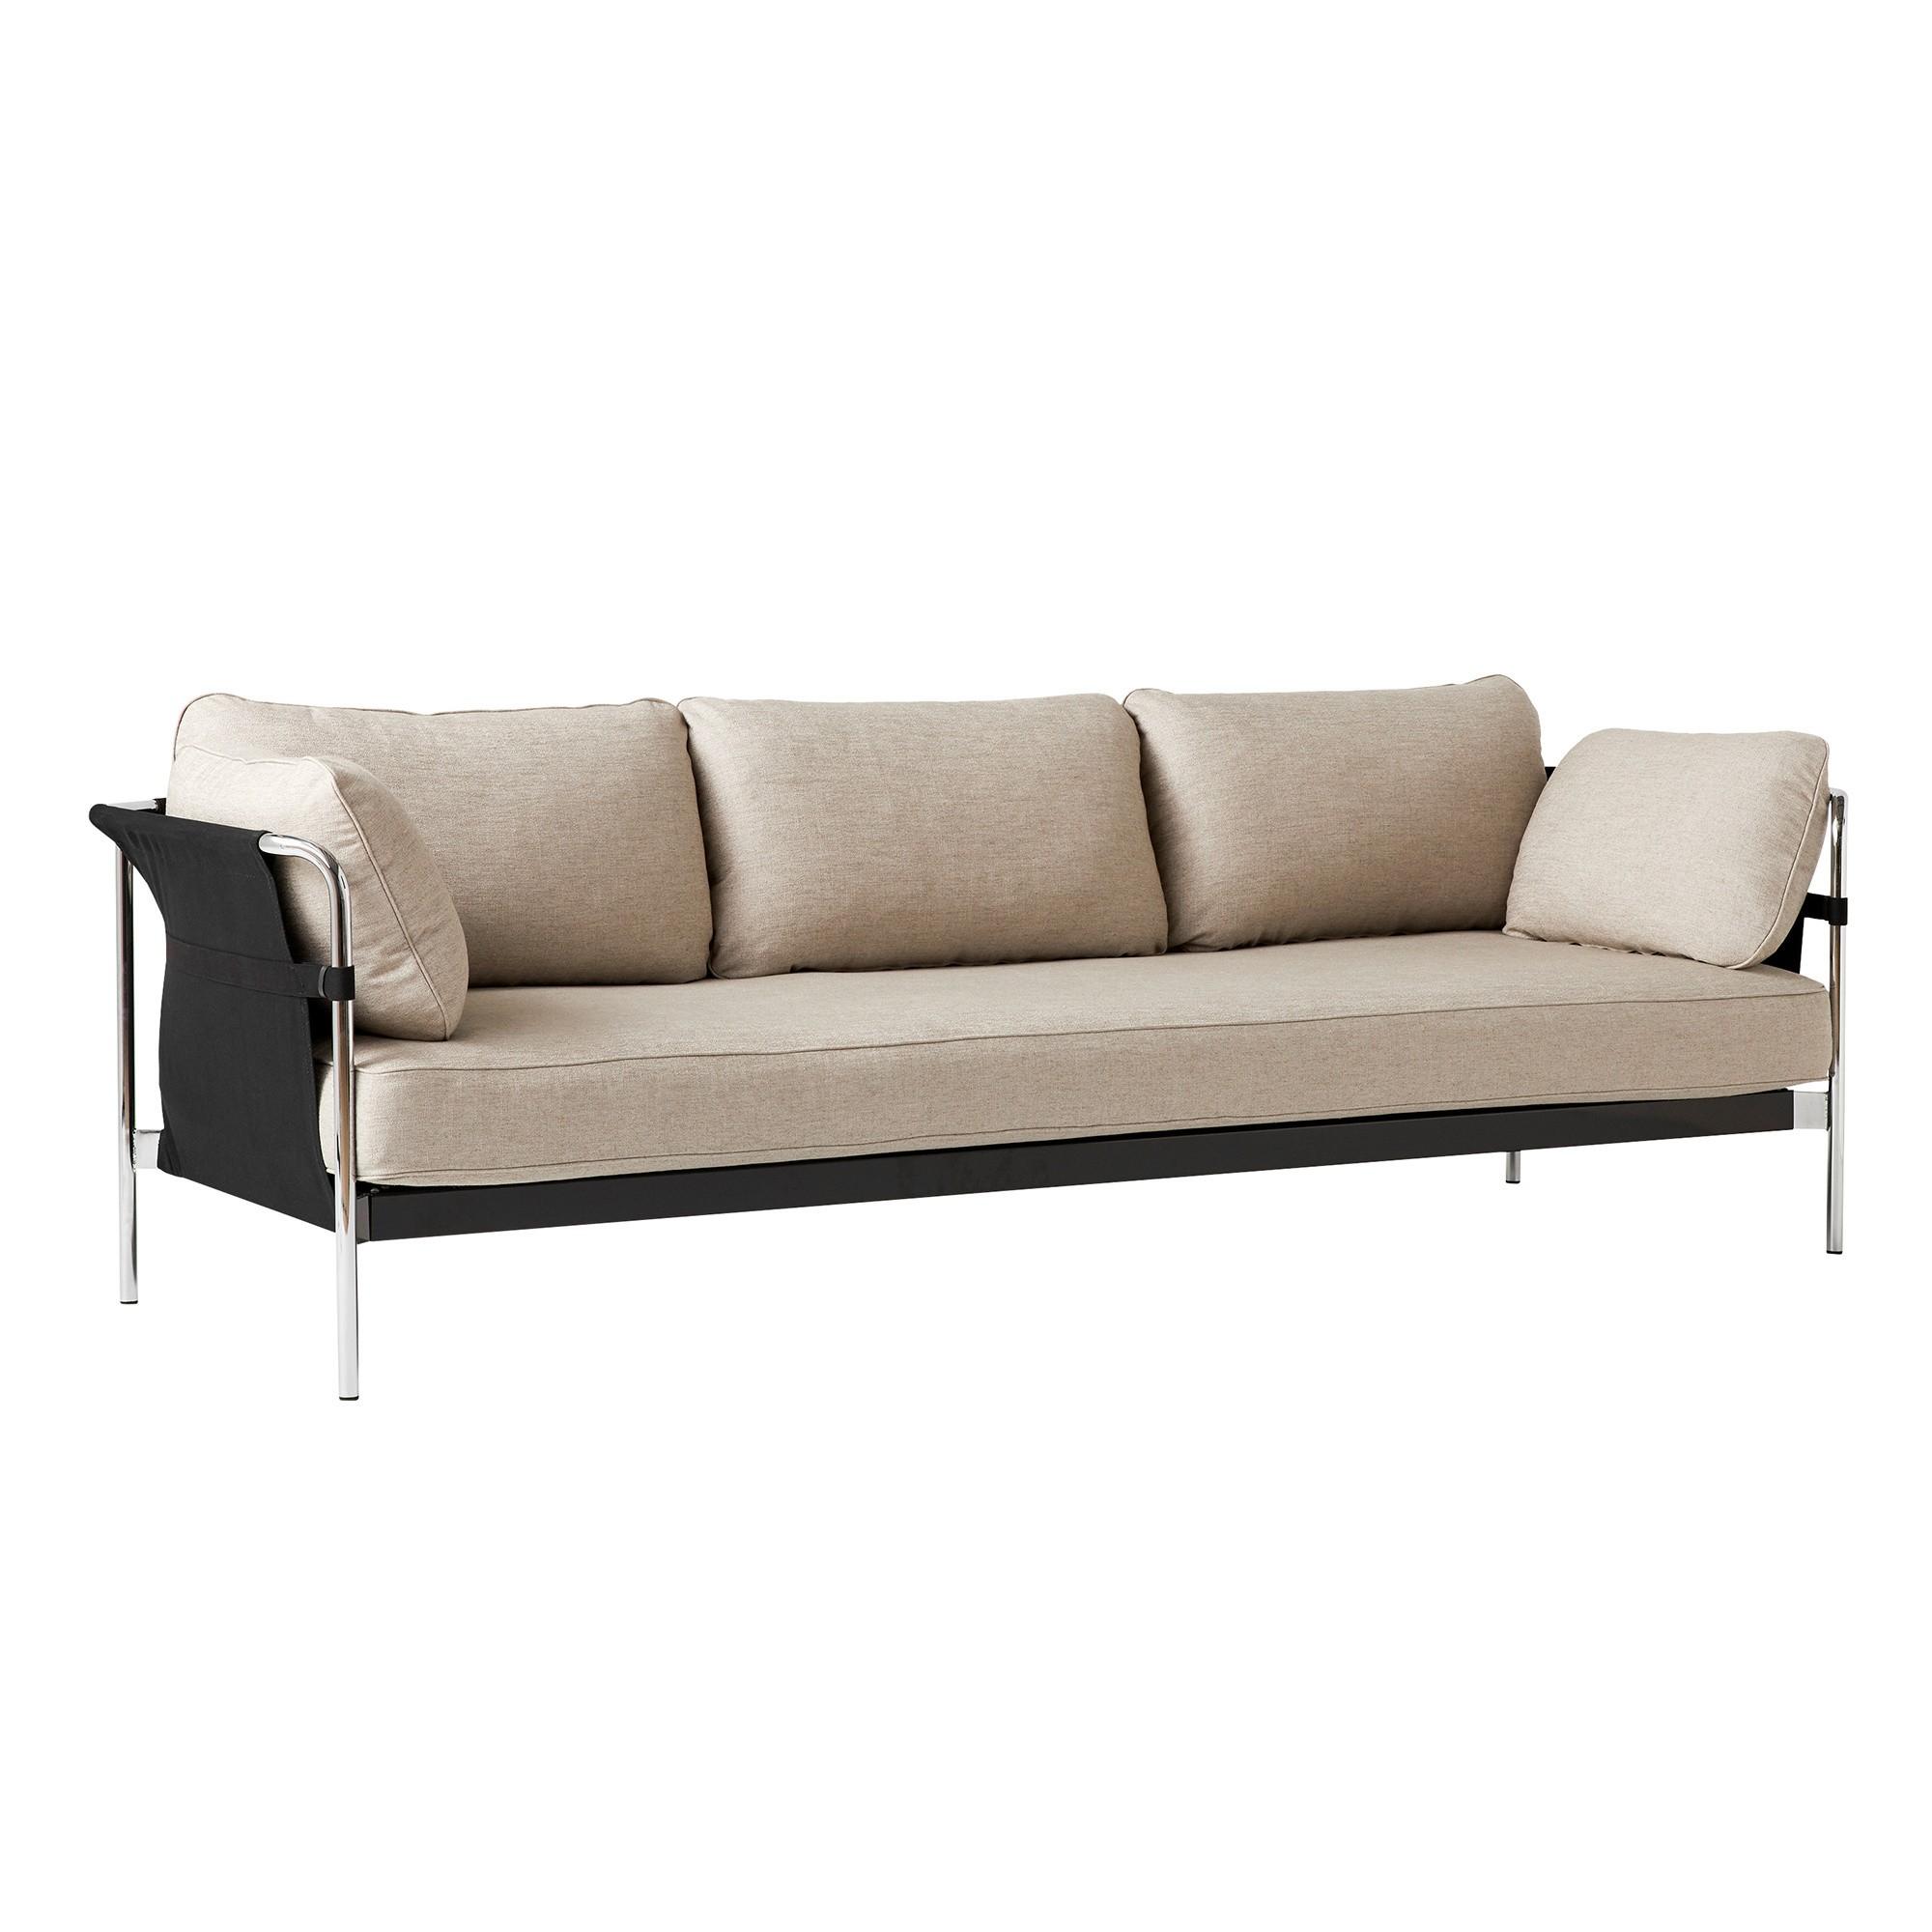 Full Size of 3 Sitzer Sofa Mit Relaxfunktion Elektrisch Und 2 Sessel Ikea Grau Couch Schlaffunktion Bettkasten Leder Rot Nockeby Poco Bettfunktion Hay Can 20 Gestell Stahl Sofa 3 Sitzer Sofa